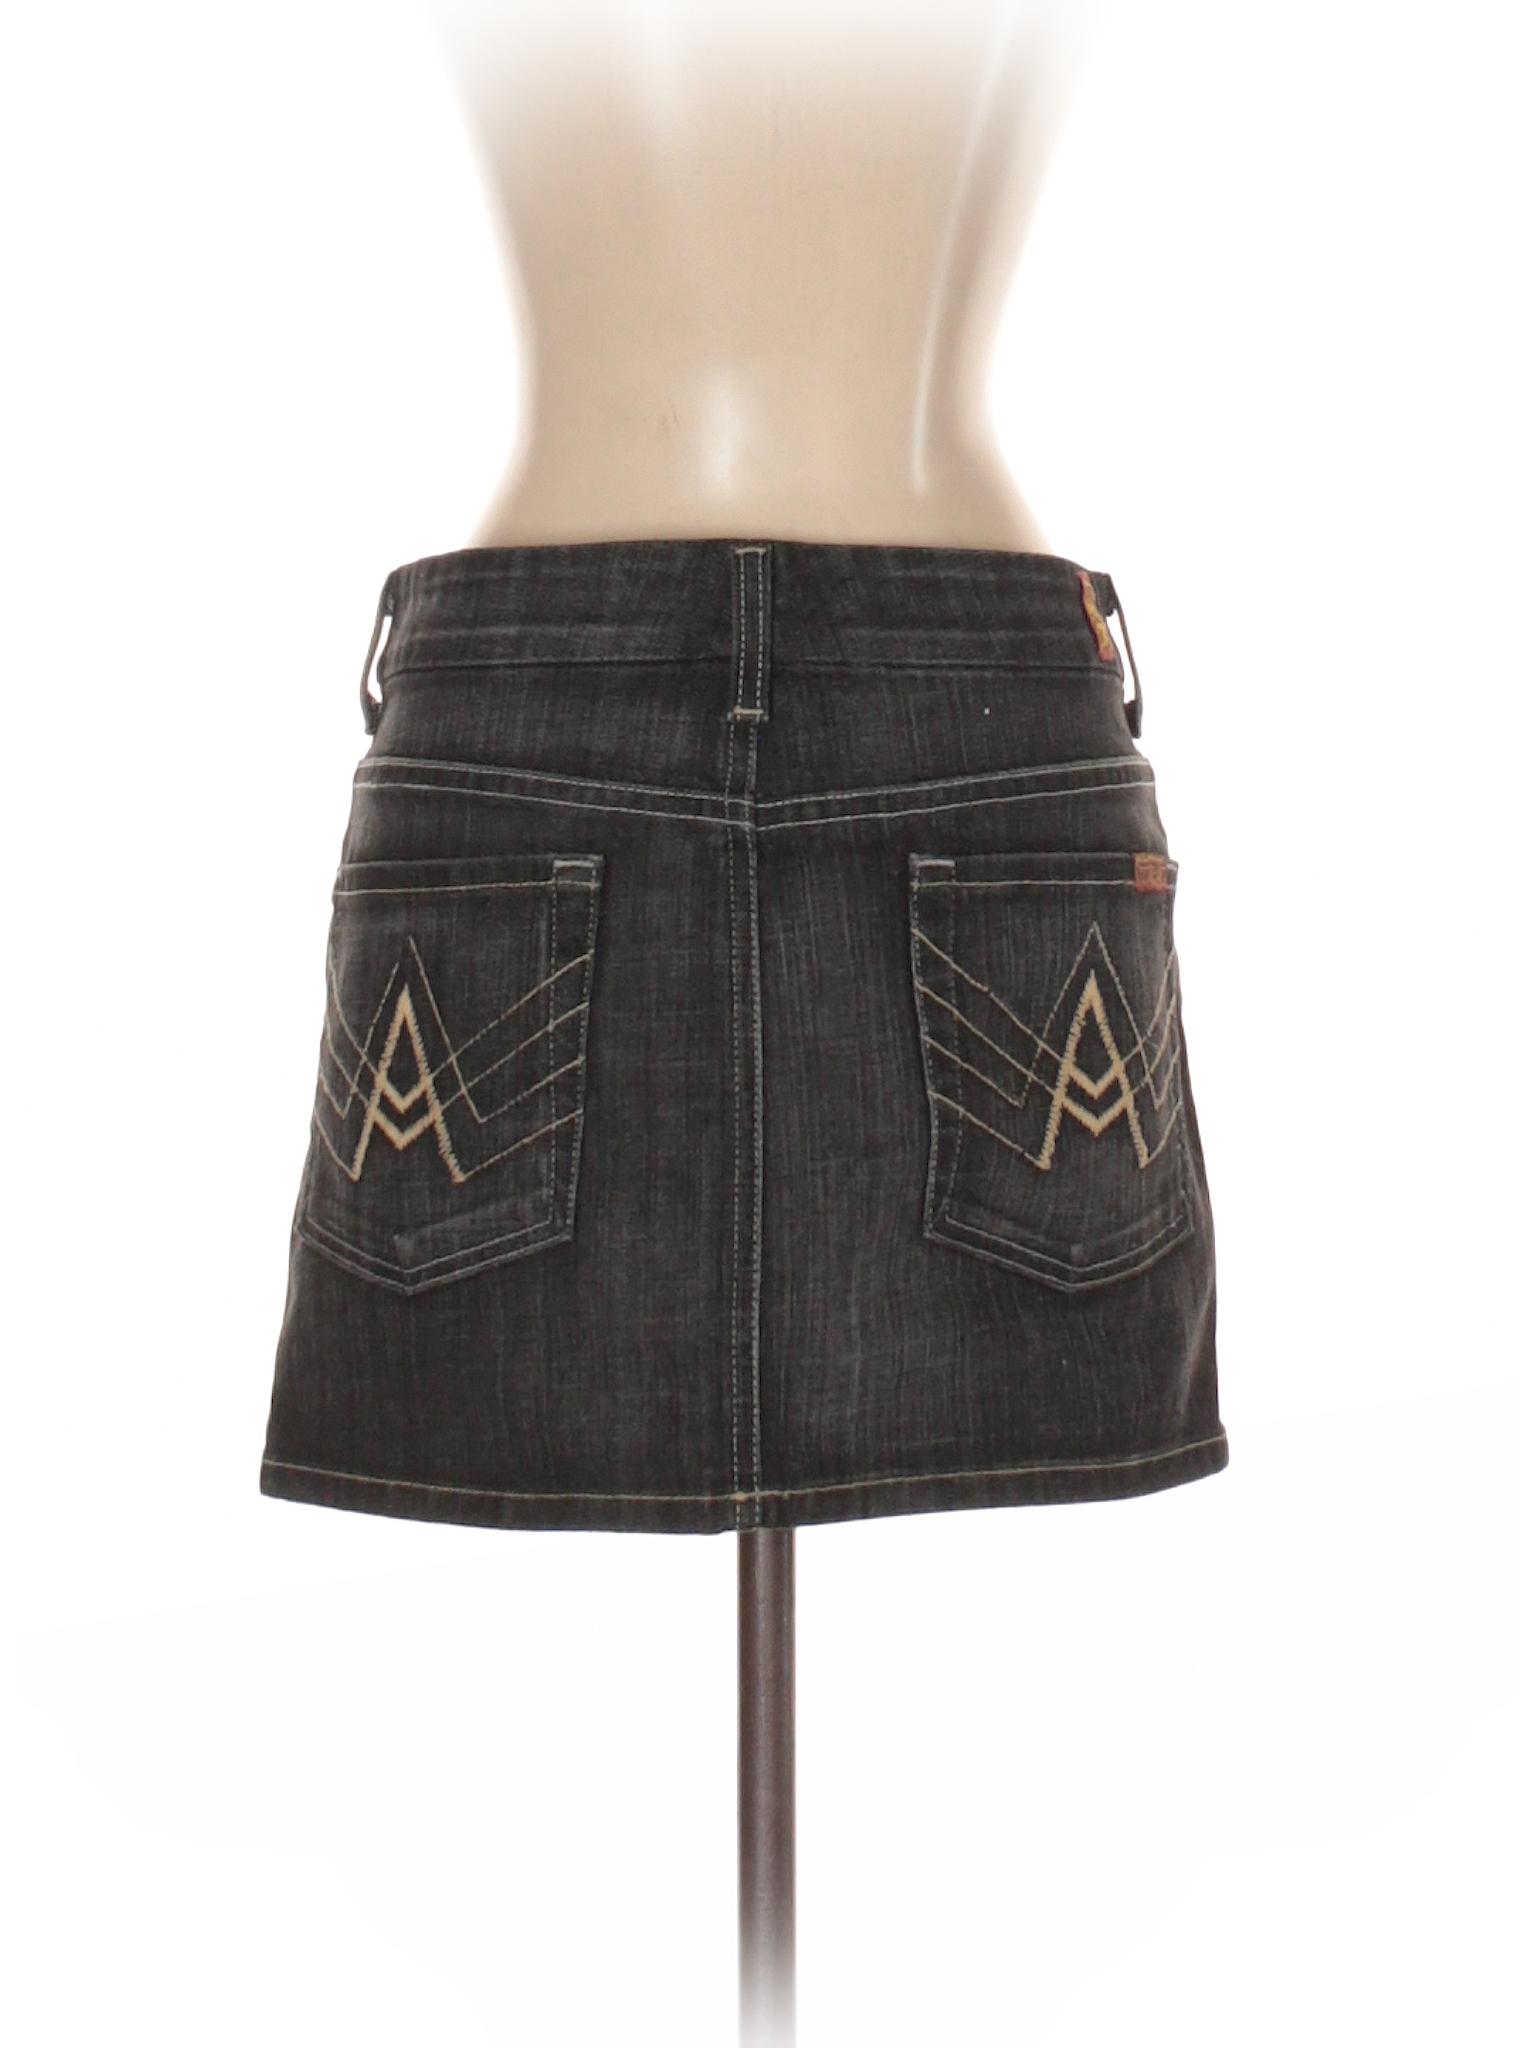 All Denim 7 leisure Mankind Boutique Skirt For qS6tn7RxXw